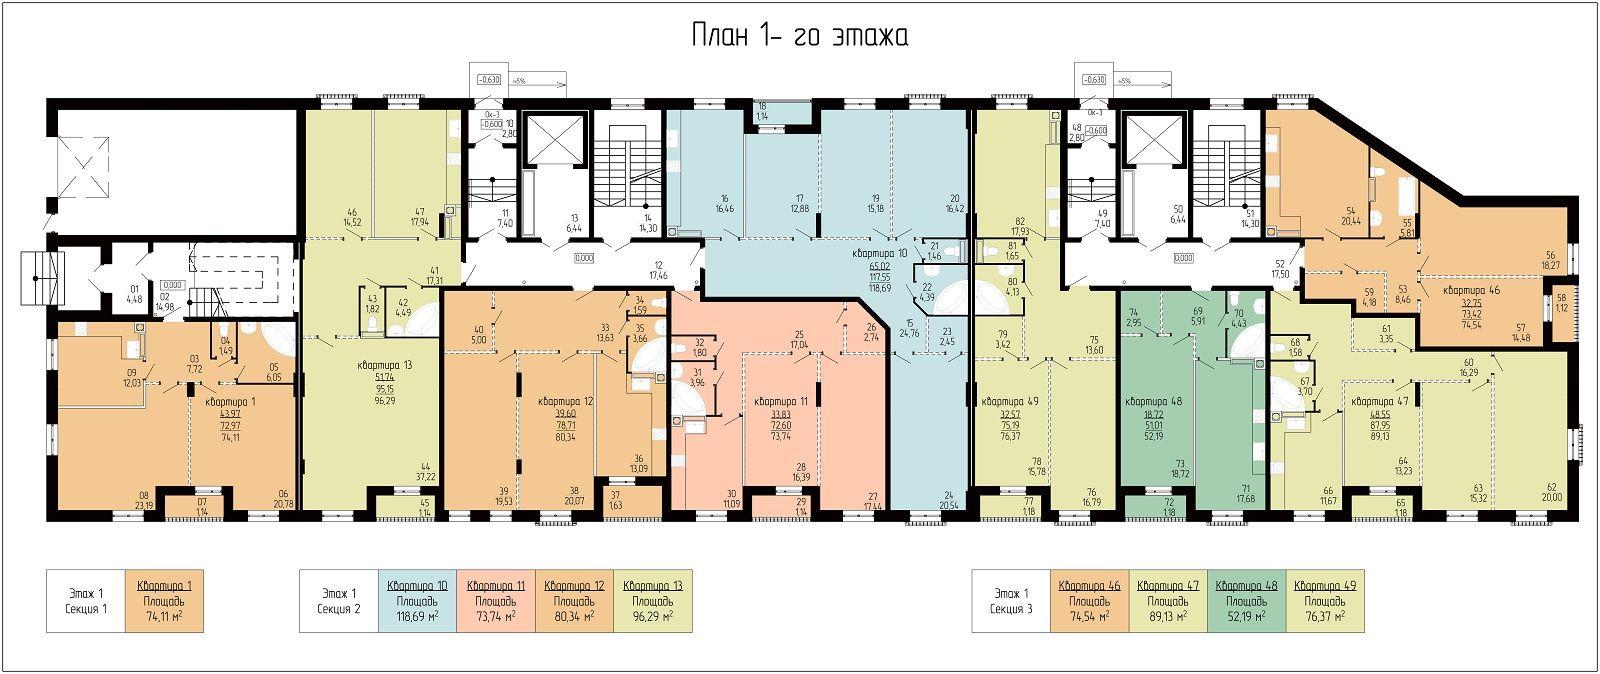 Планировка квартир в доме по адресу